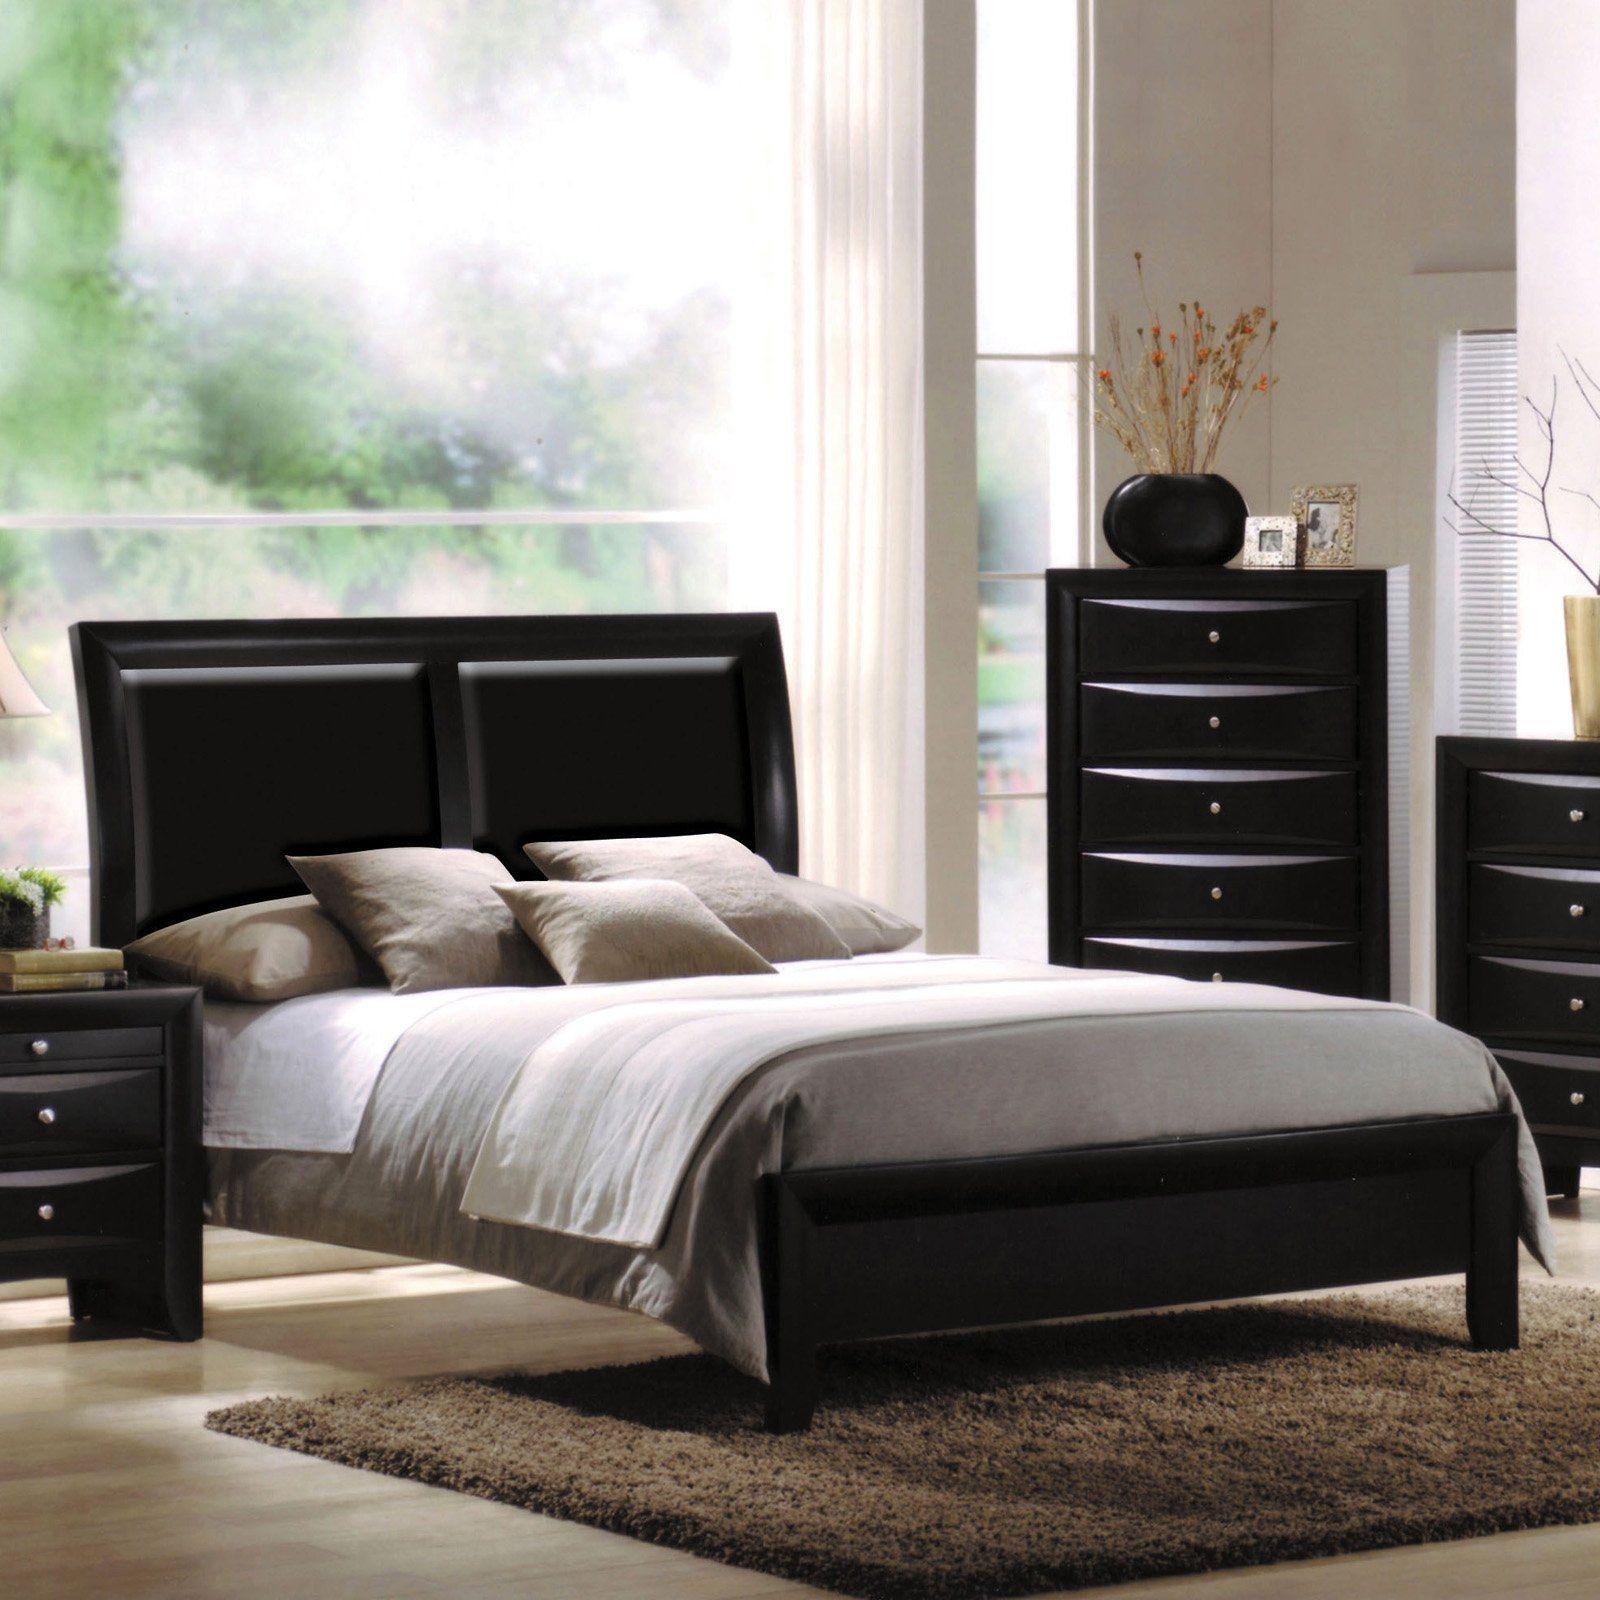 Acme Furniture Ireland I Black Low Profile Bed, Size